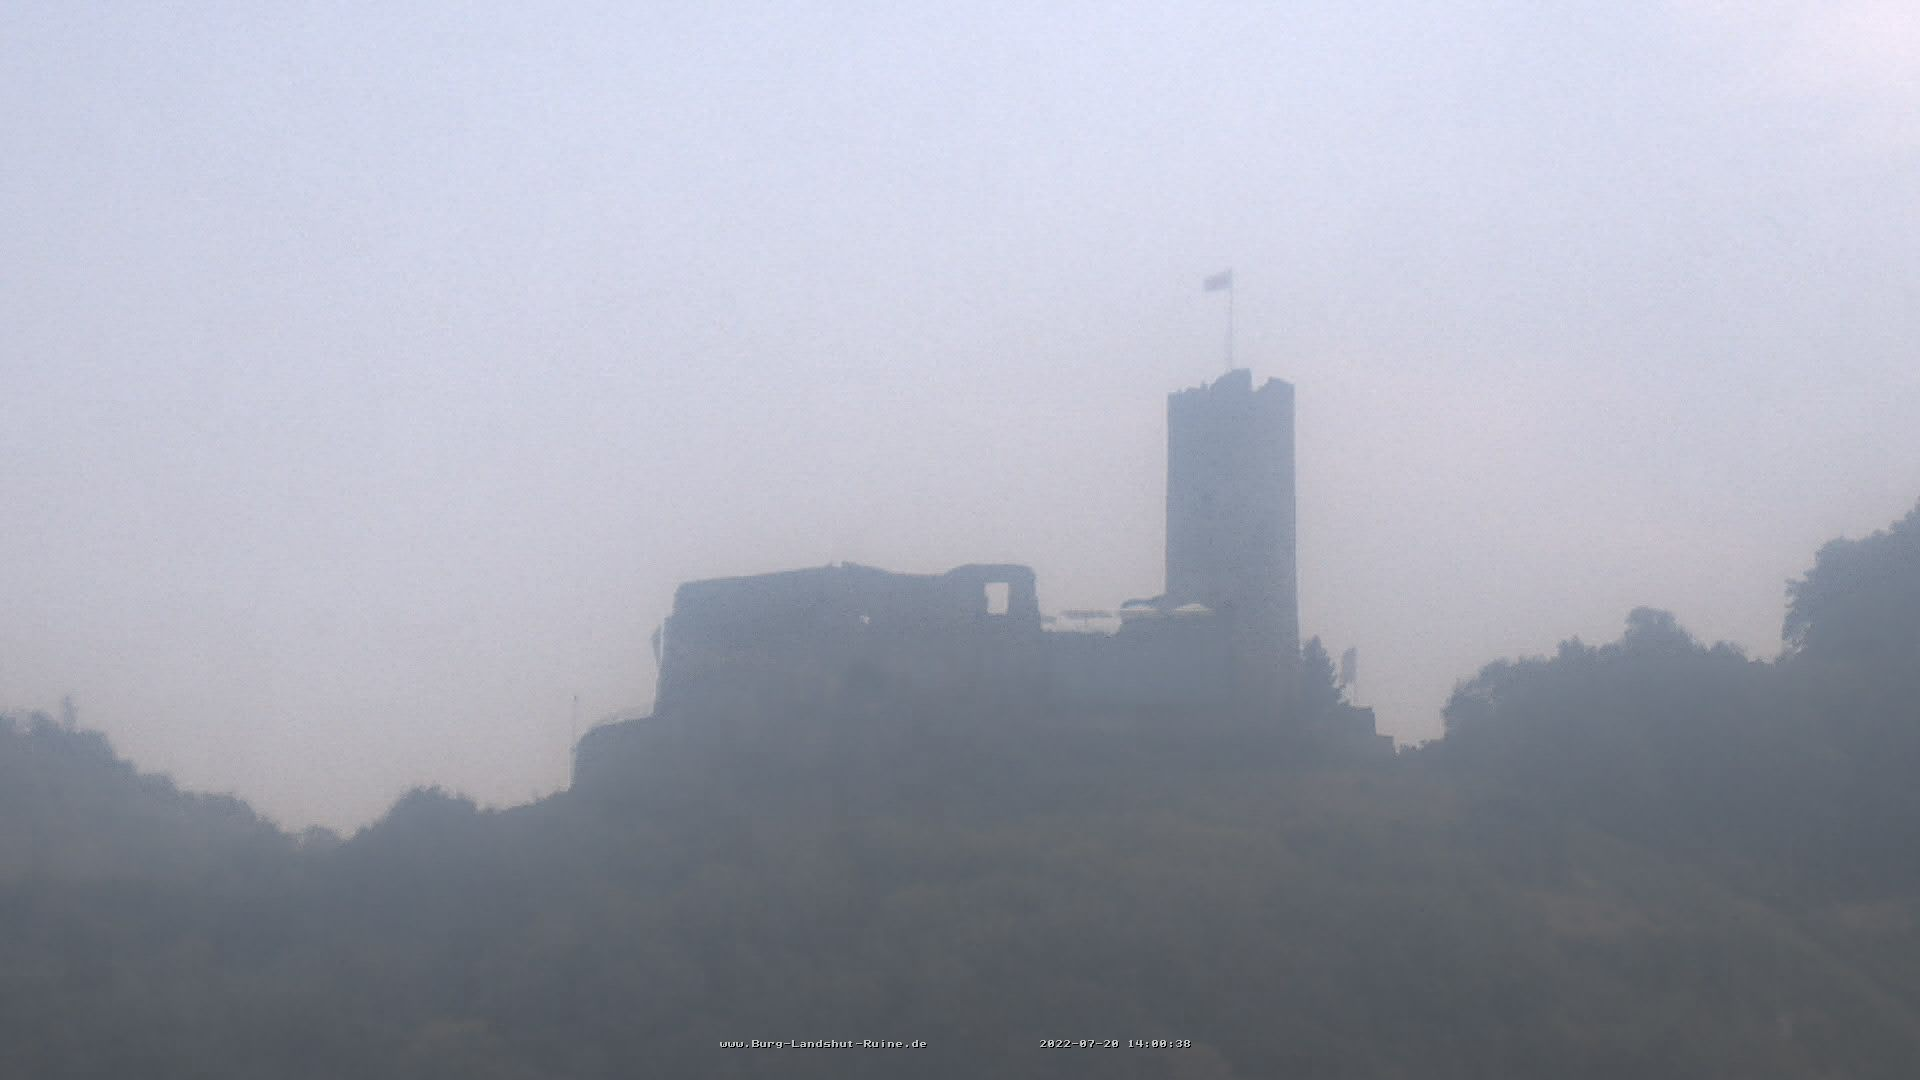 Bernkastel-Kues Mon. 14:00